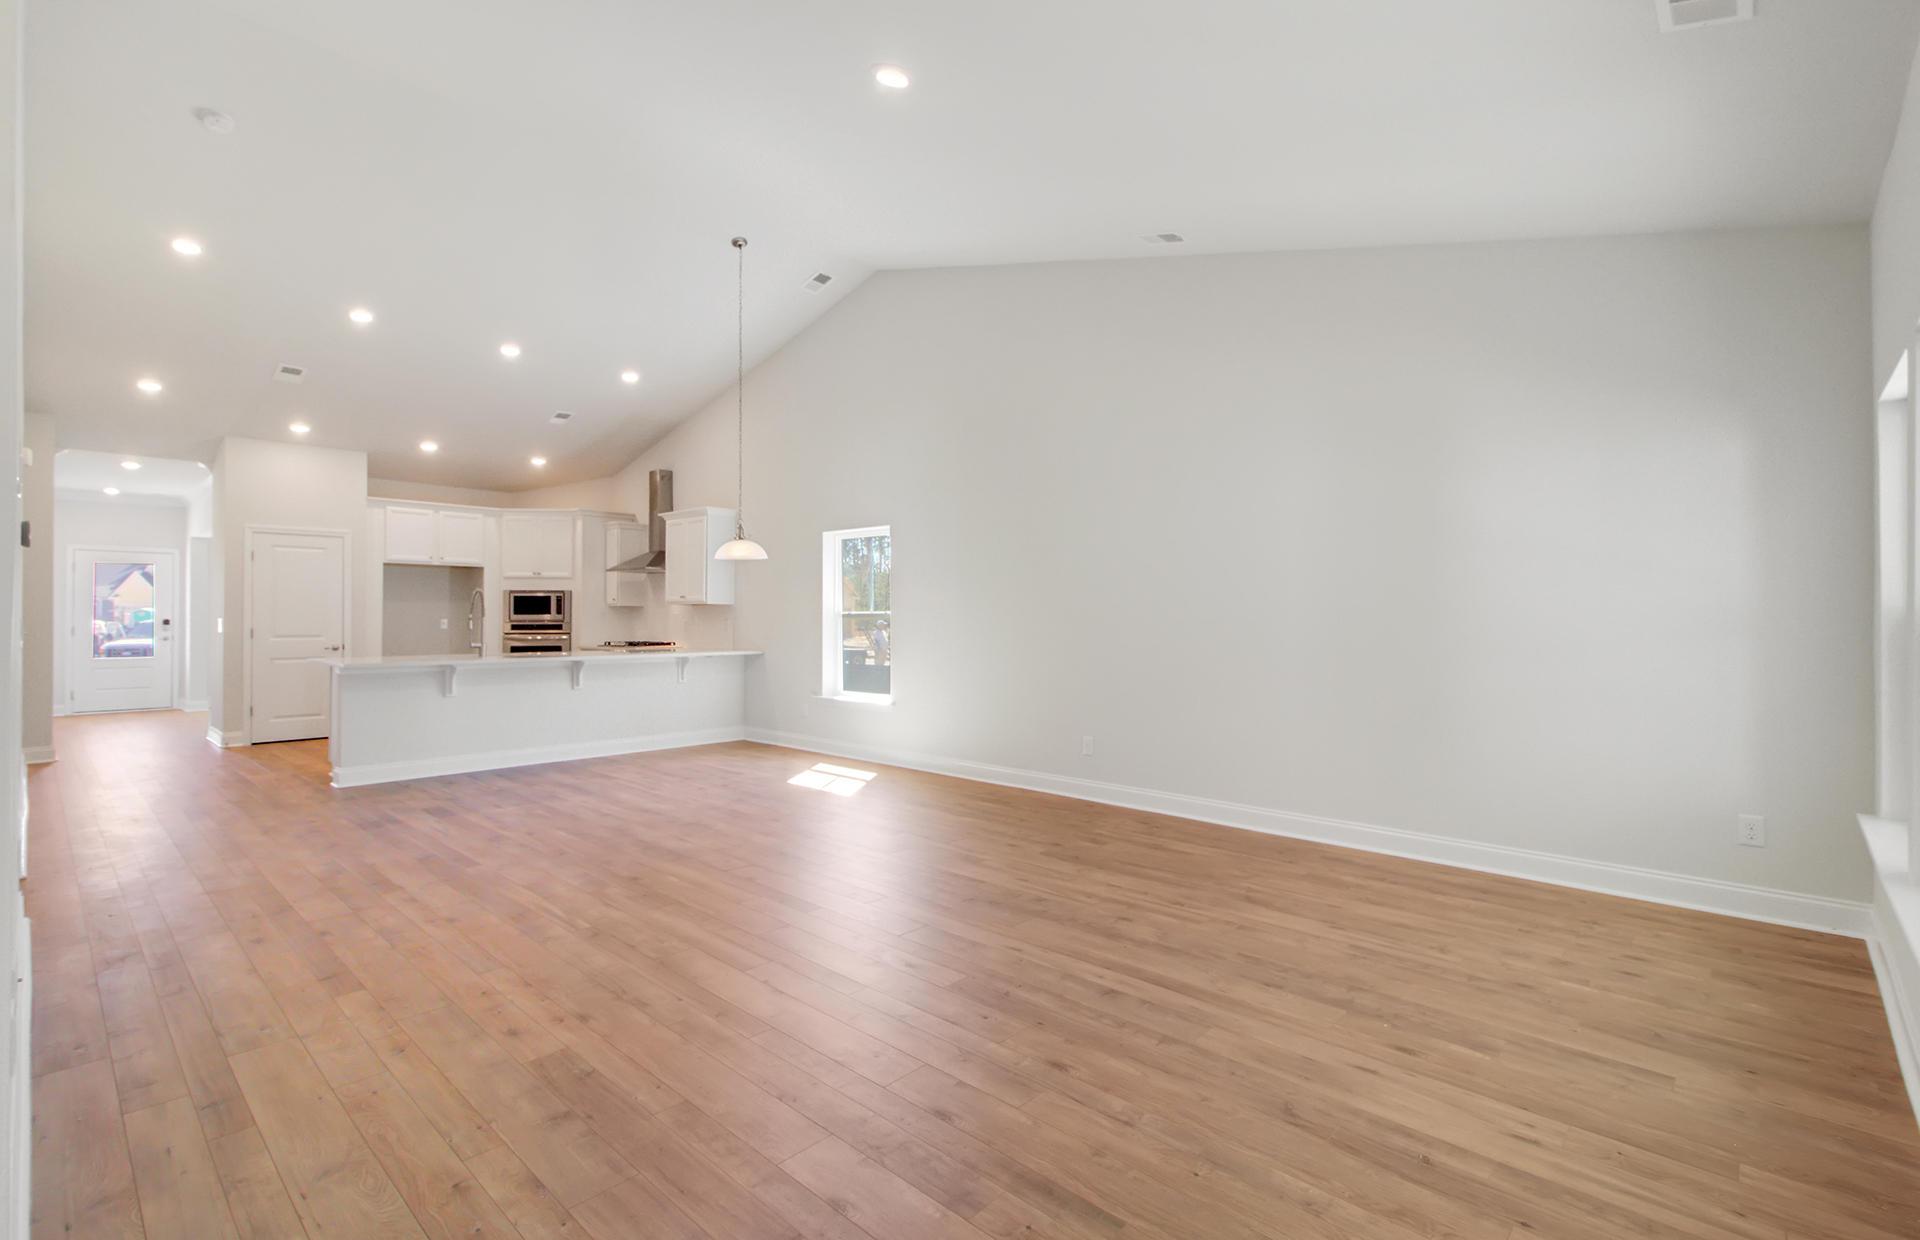 Park West Homes For Sale - 3062 Rice Field, Mount Pleasant, SC - 0